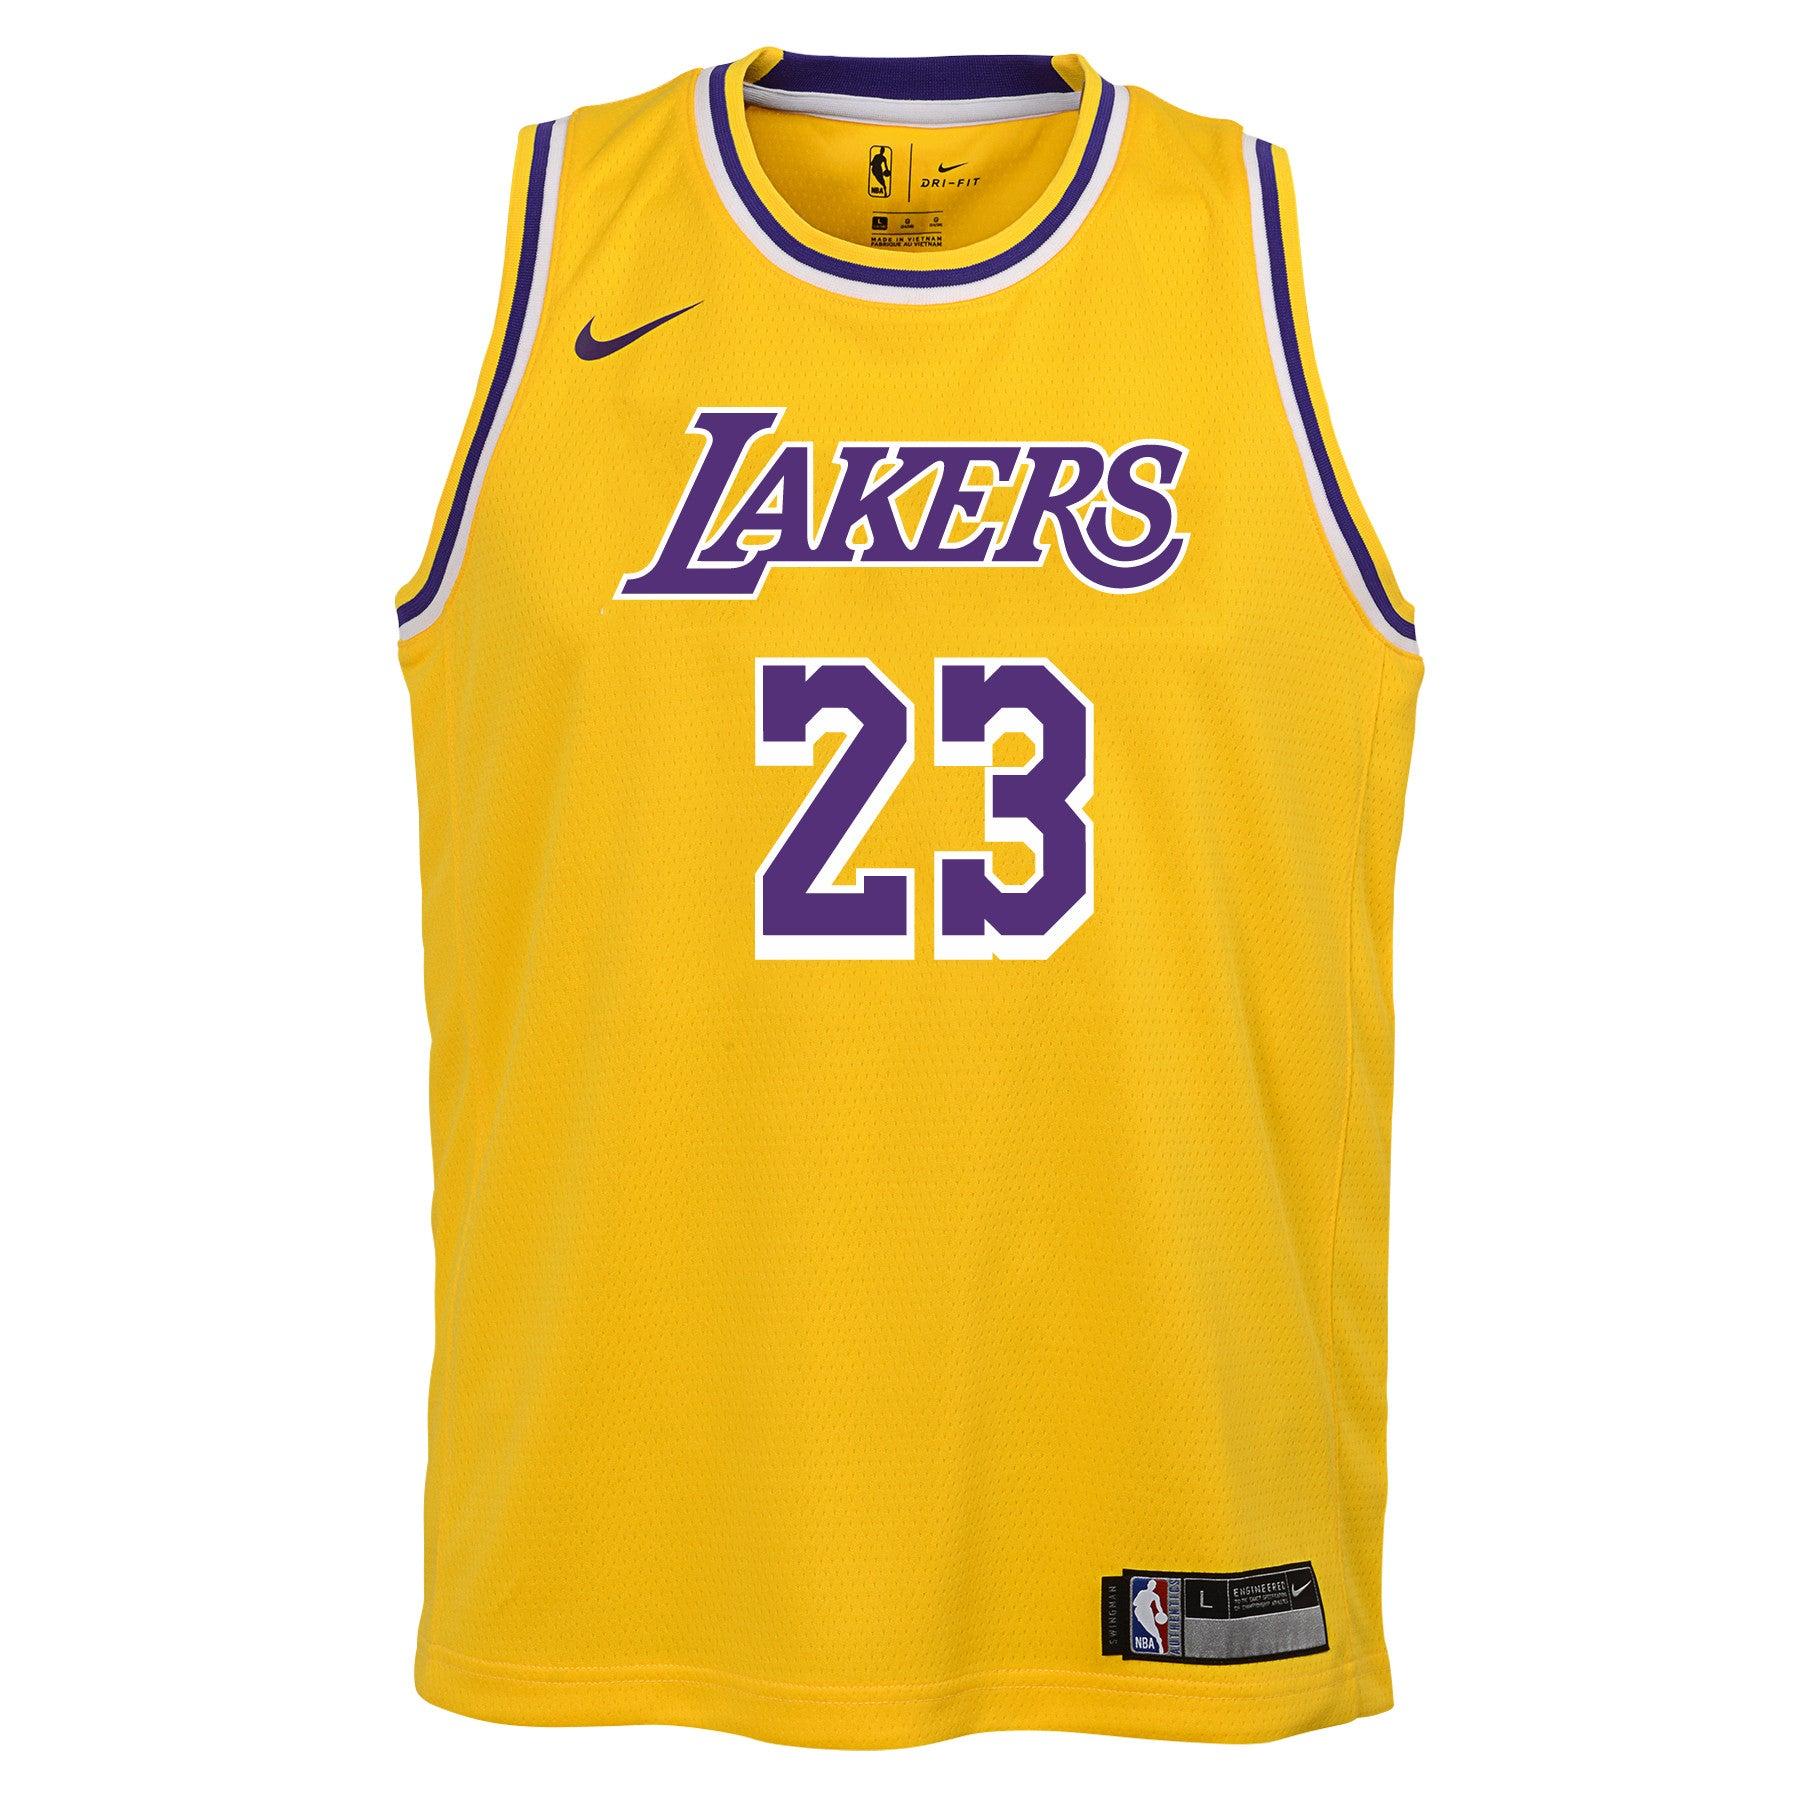 Lebron James #23 LA Lakers Los Angeles Golden Edition Basketball Jersey Black